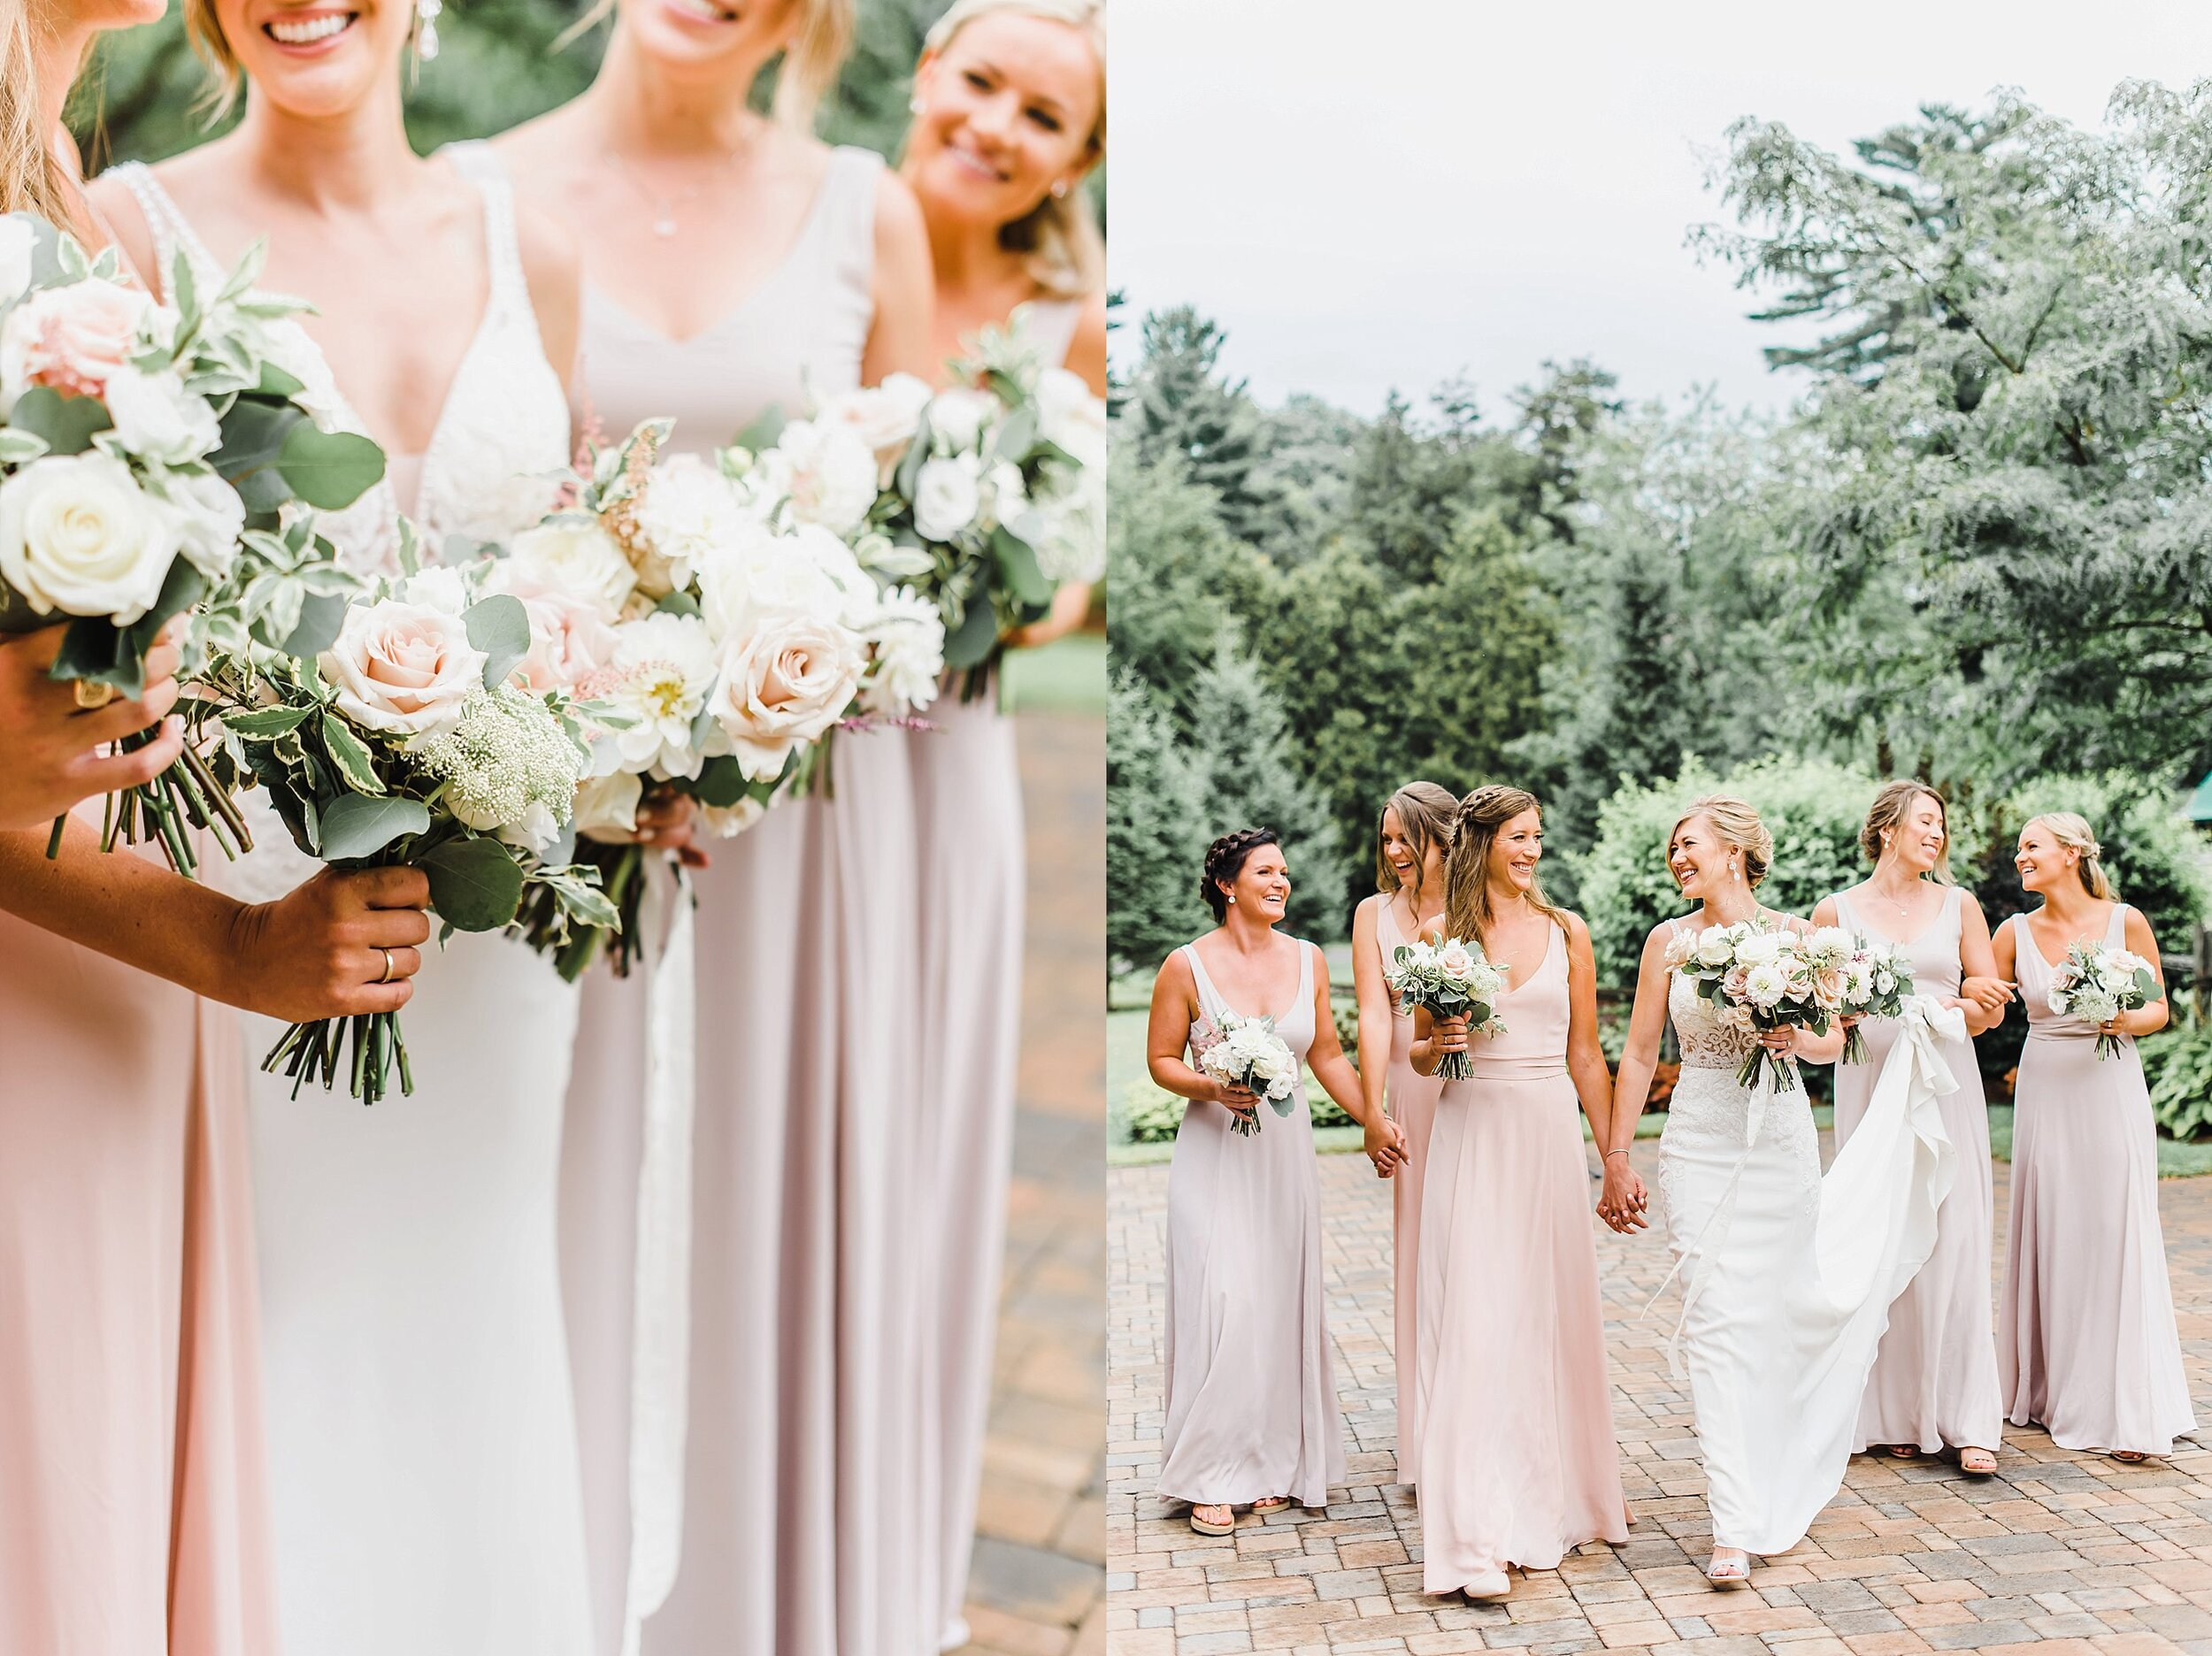 light airy fine art ottawa wedding photographer | Ali and Batoul Photography | Fairmont Le Chateau Montebello9.jpg